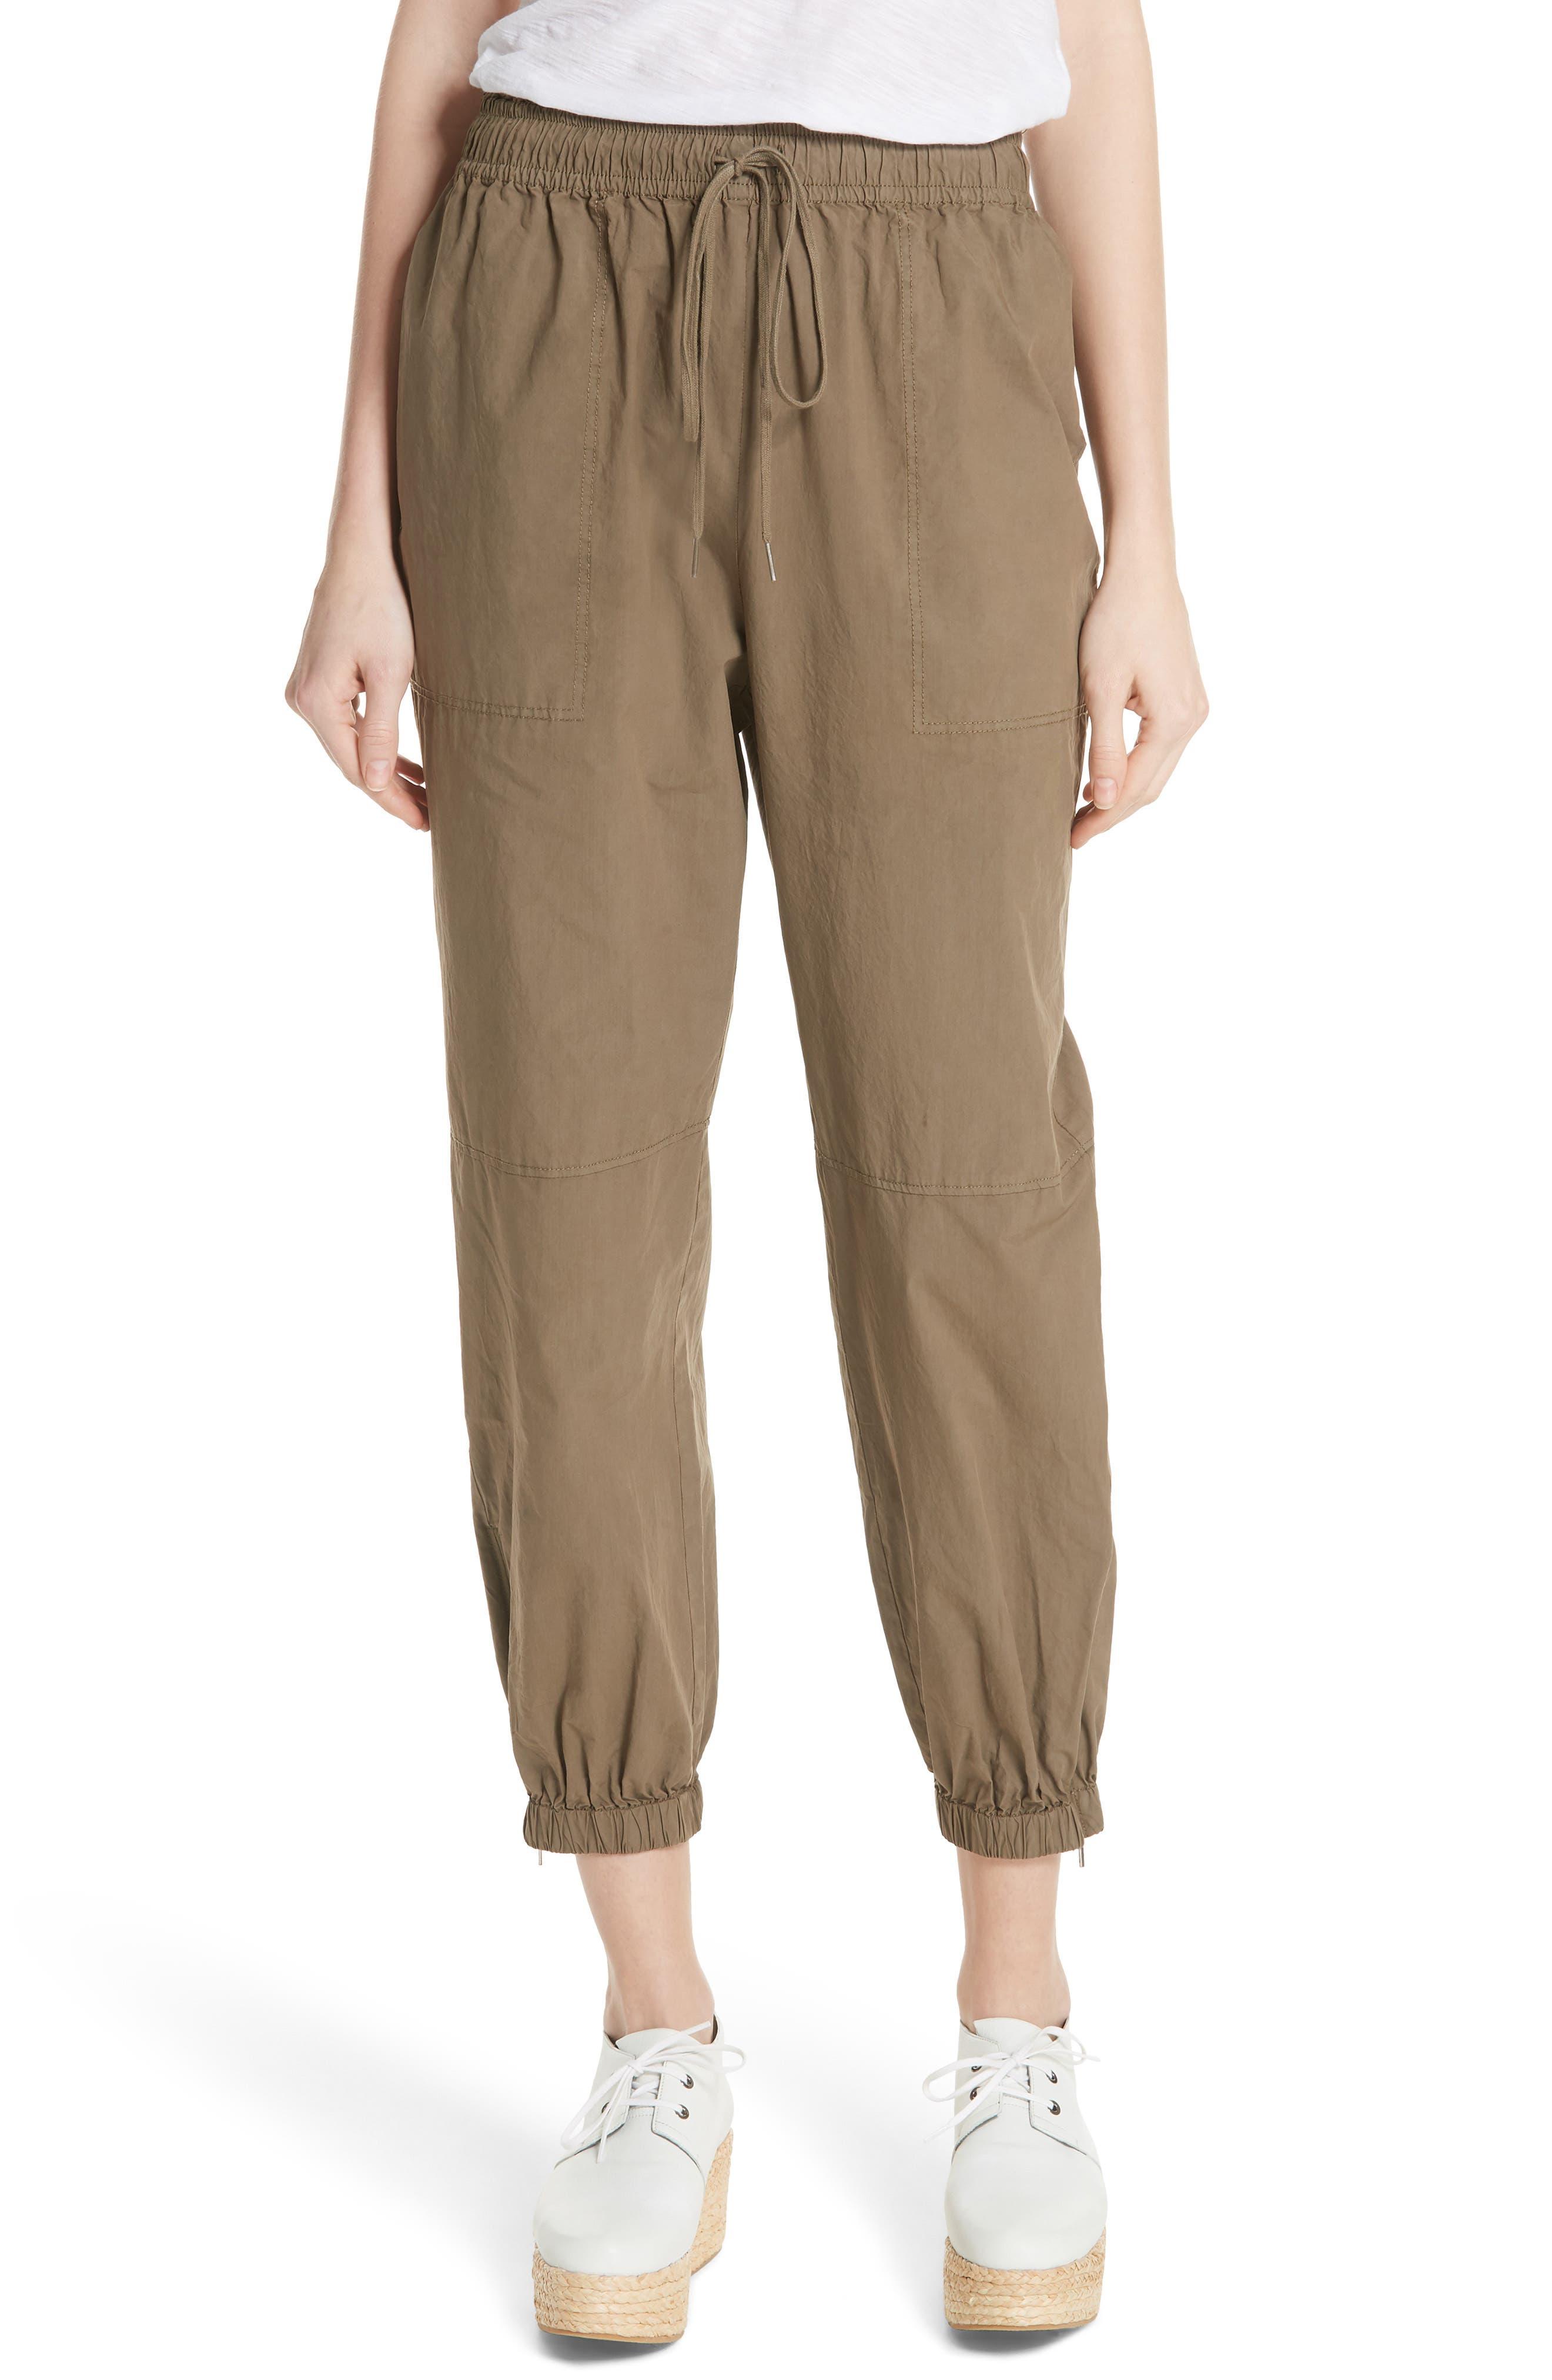 La Vie Rebecca Taylor Parachute Pants